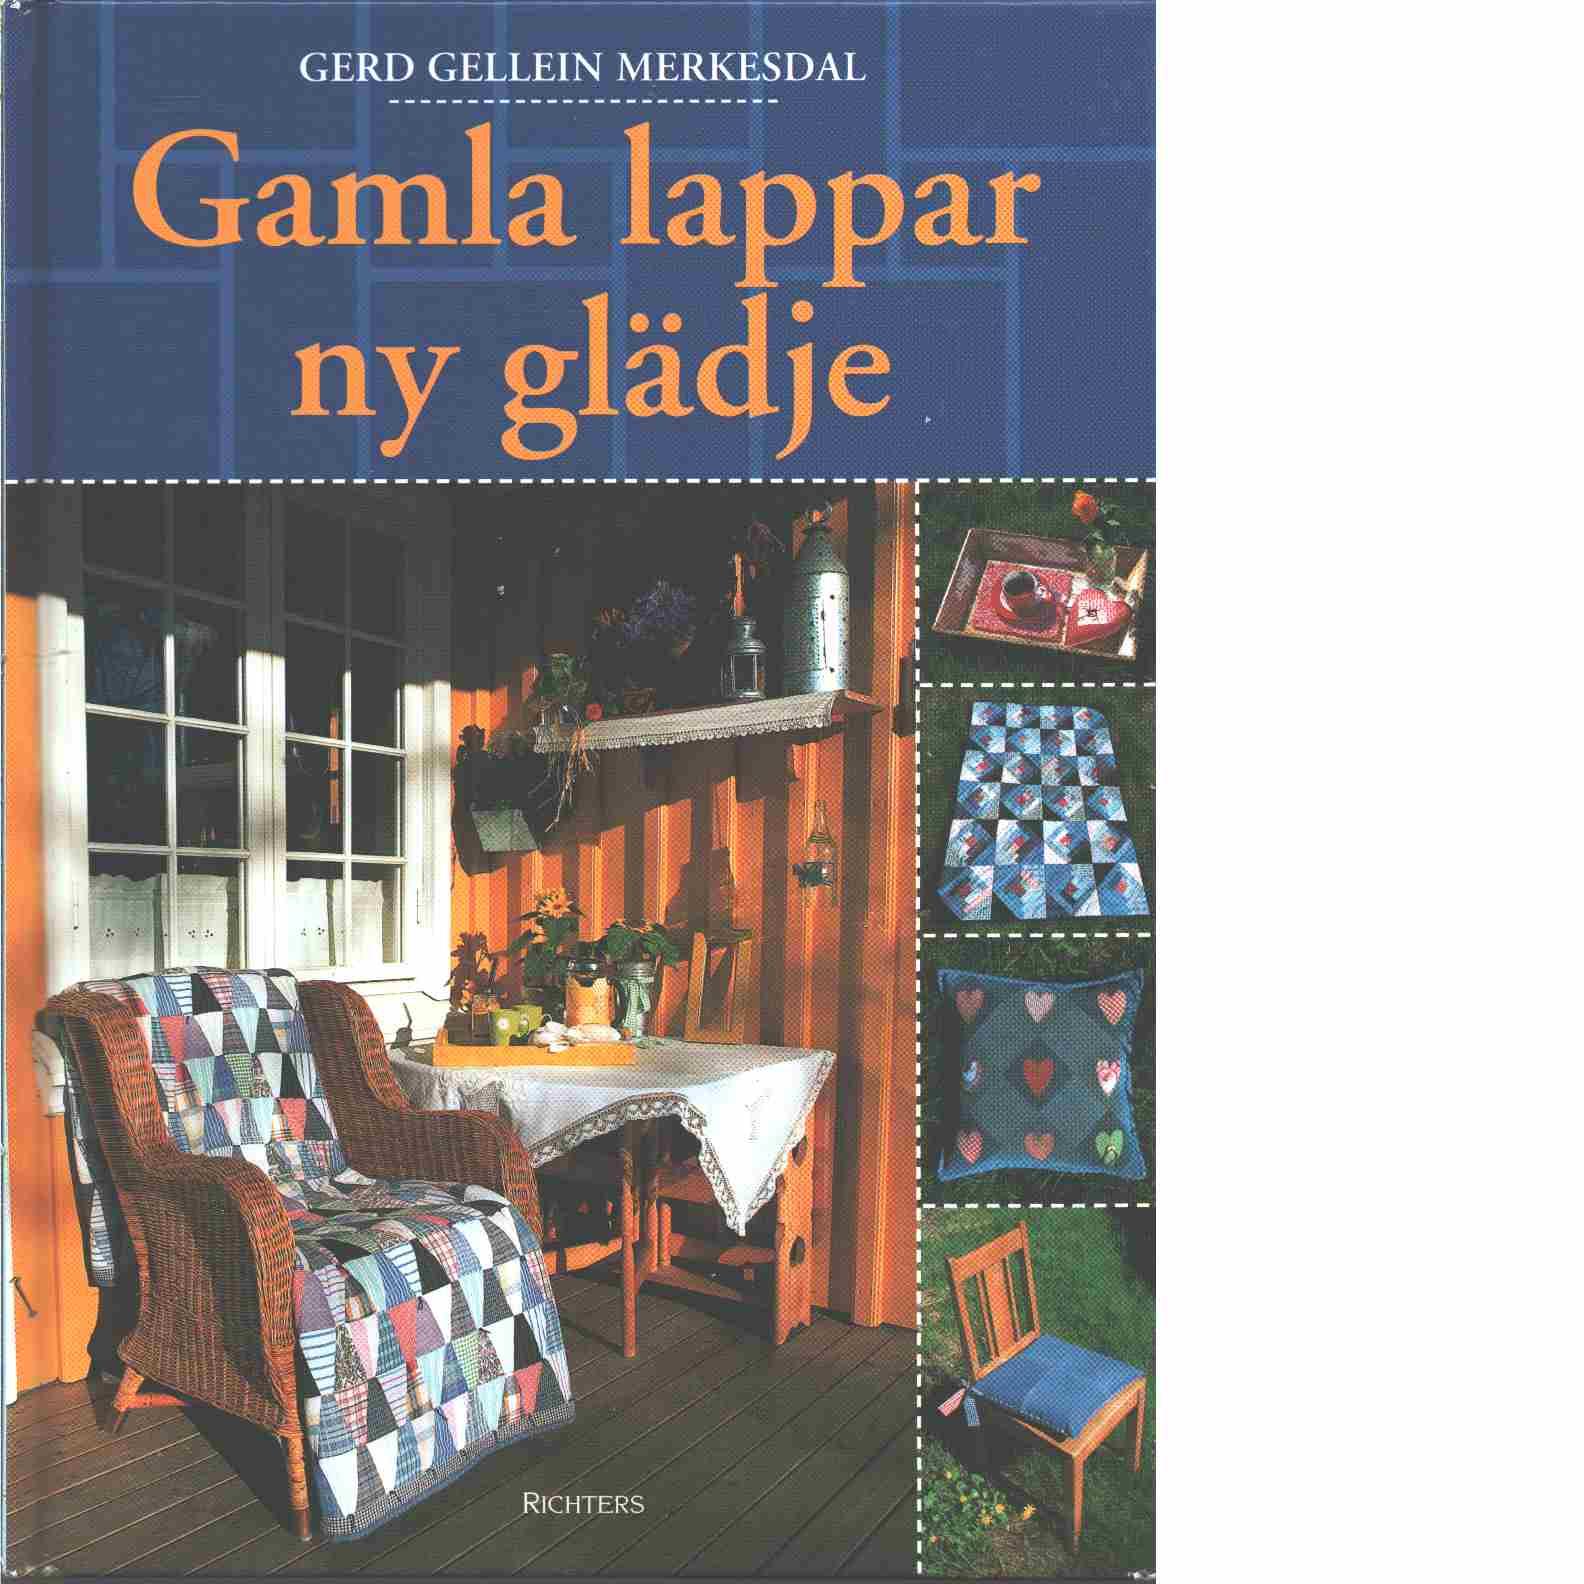 Gamla lappar - ny glädje - Merkesdal, Gerd Gellein